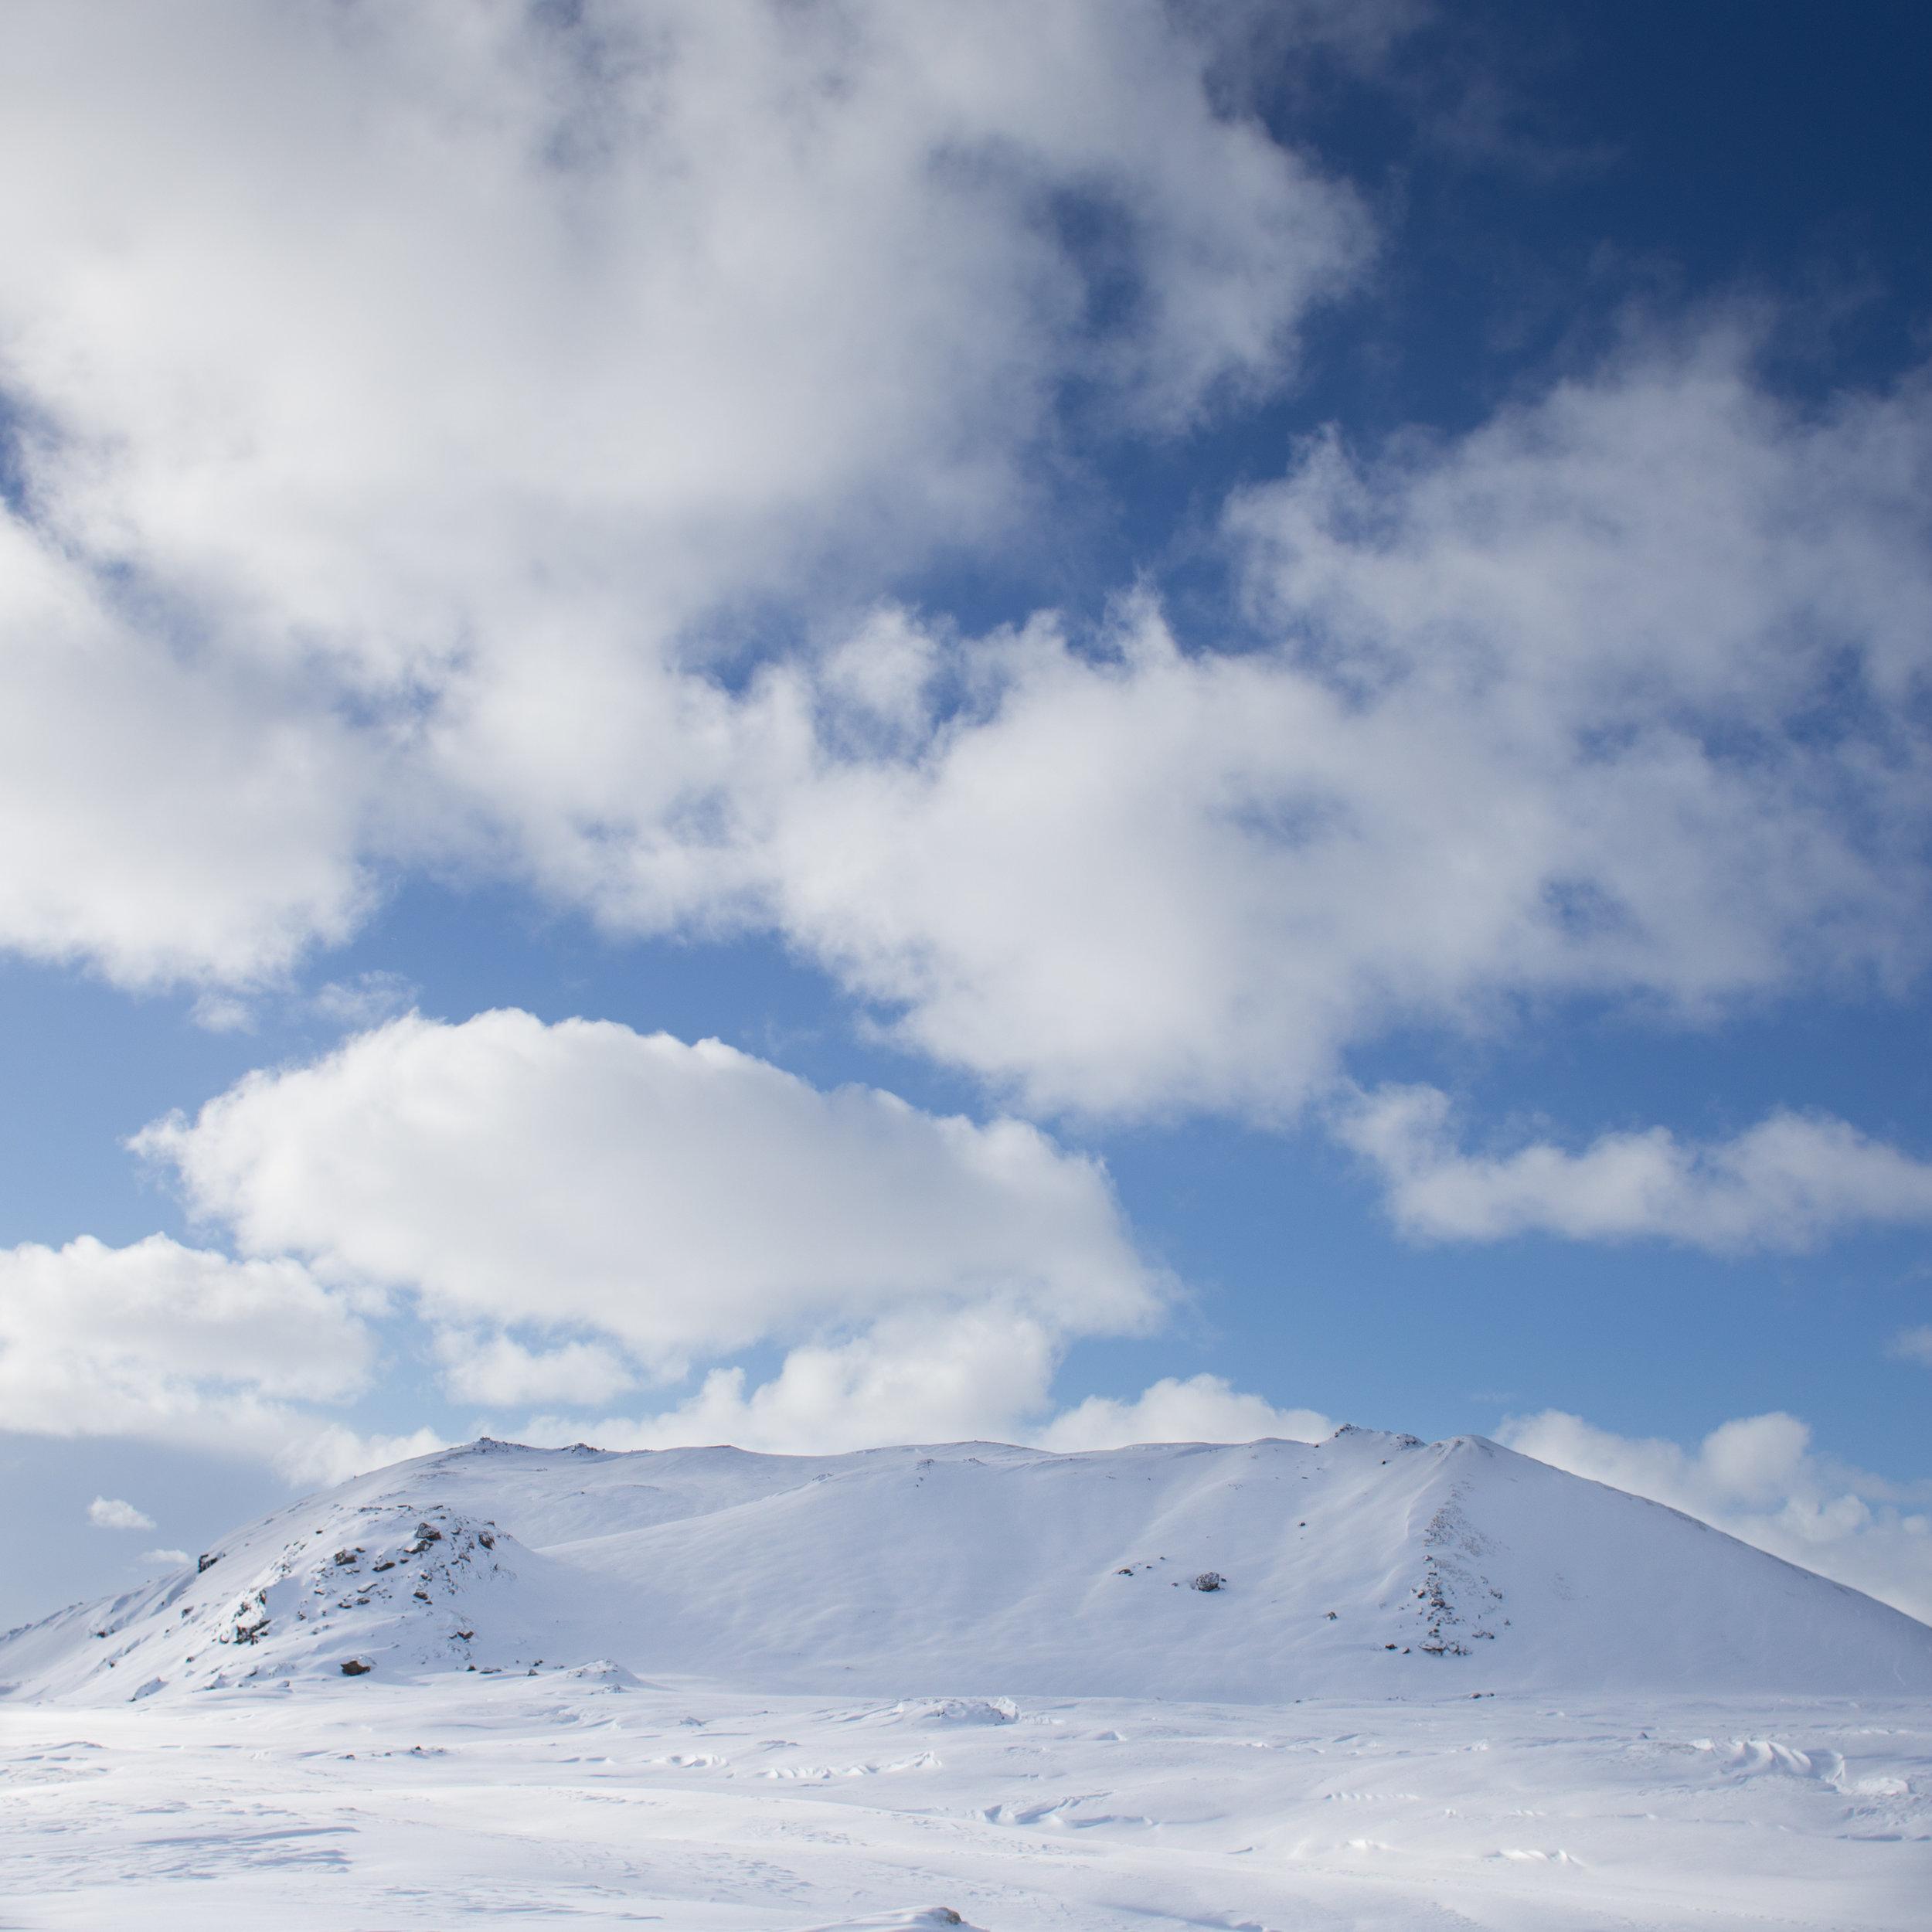 jermiah-schuster-iceland-466.jpg